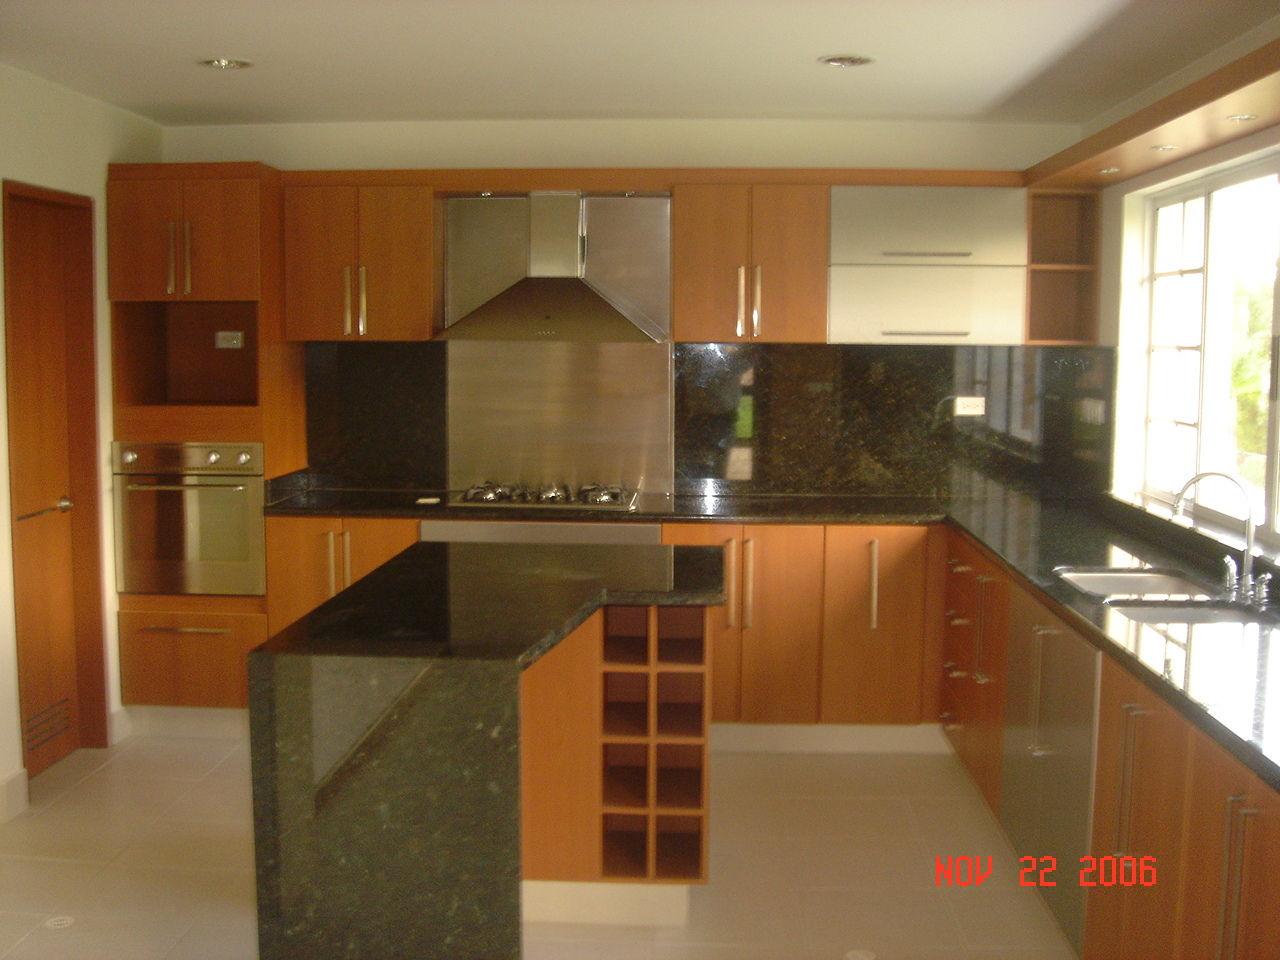 Deposito de materiales en bucaramanga pisos para for Tipos de ceramicas para pisos interiores